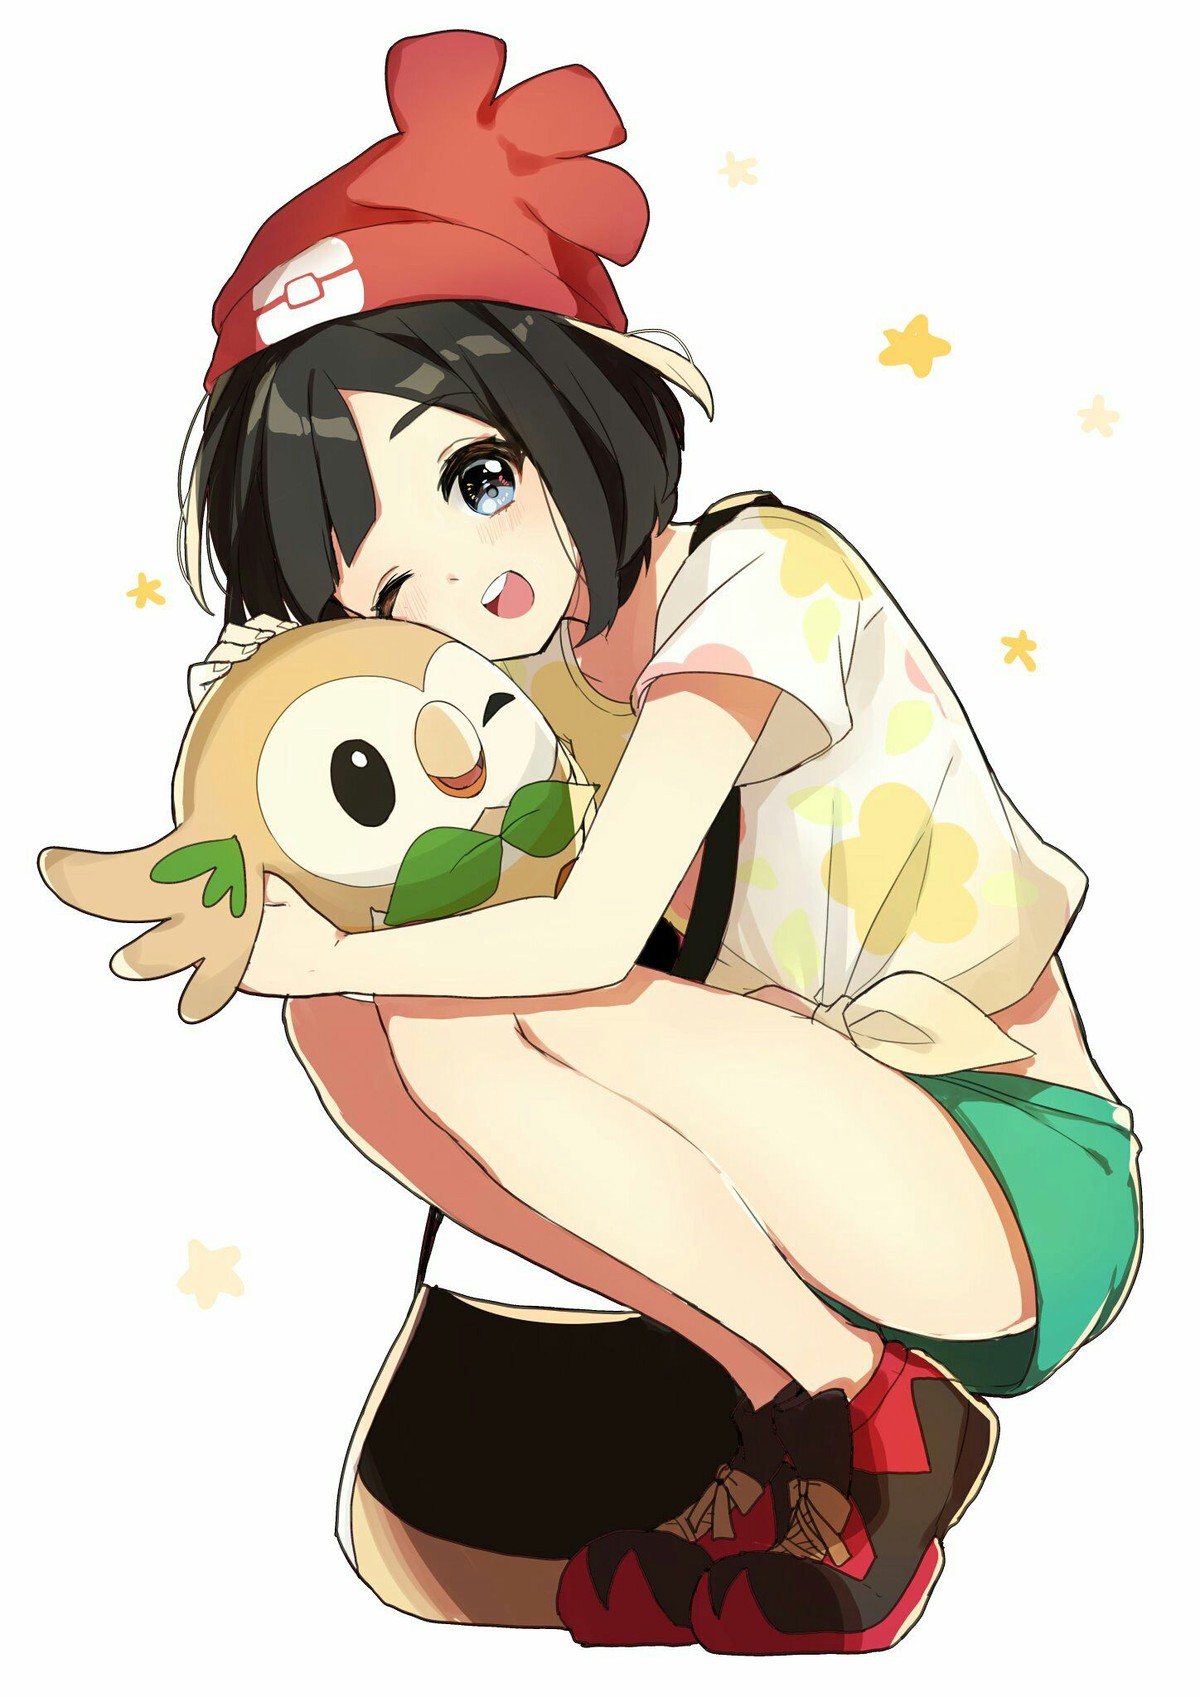 female_protagonist_(pokemon_sm)028